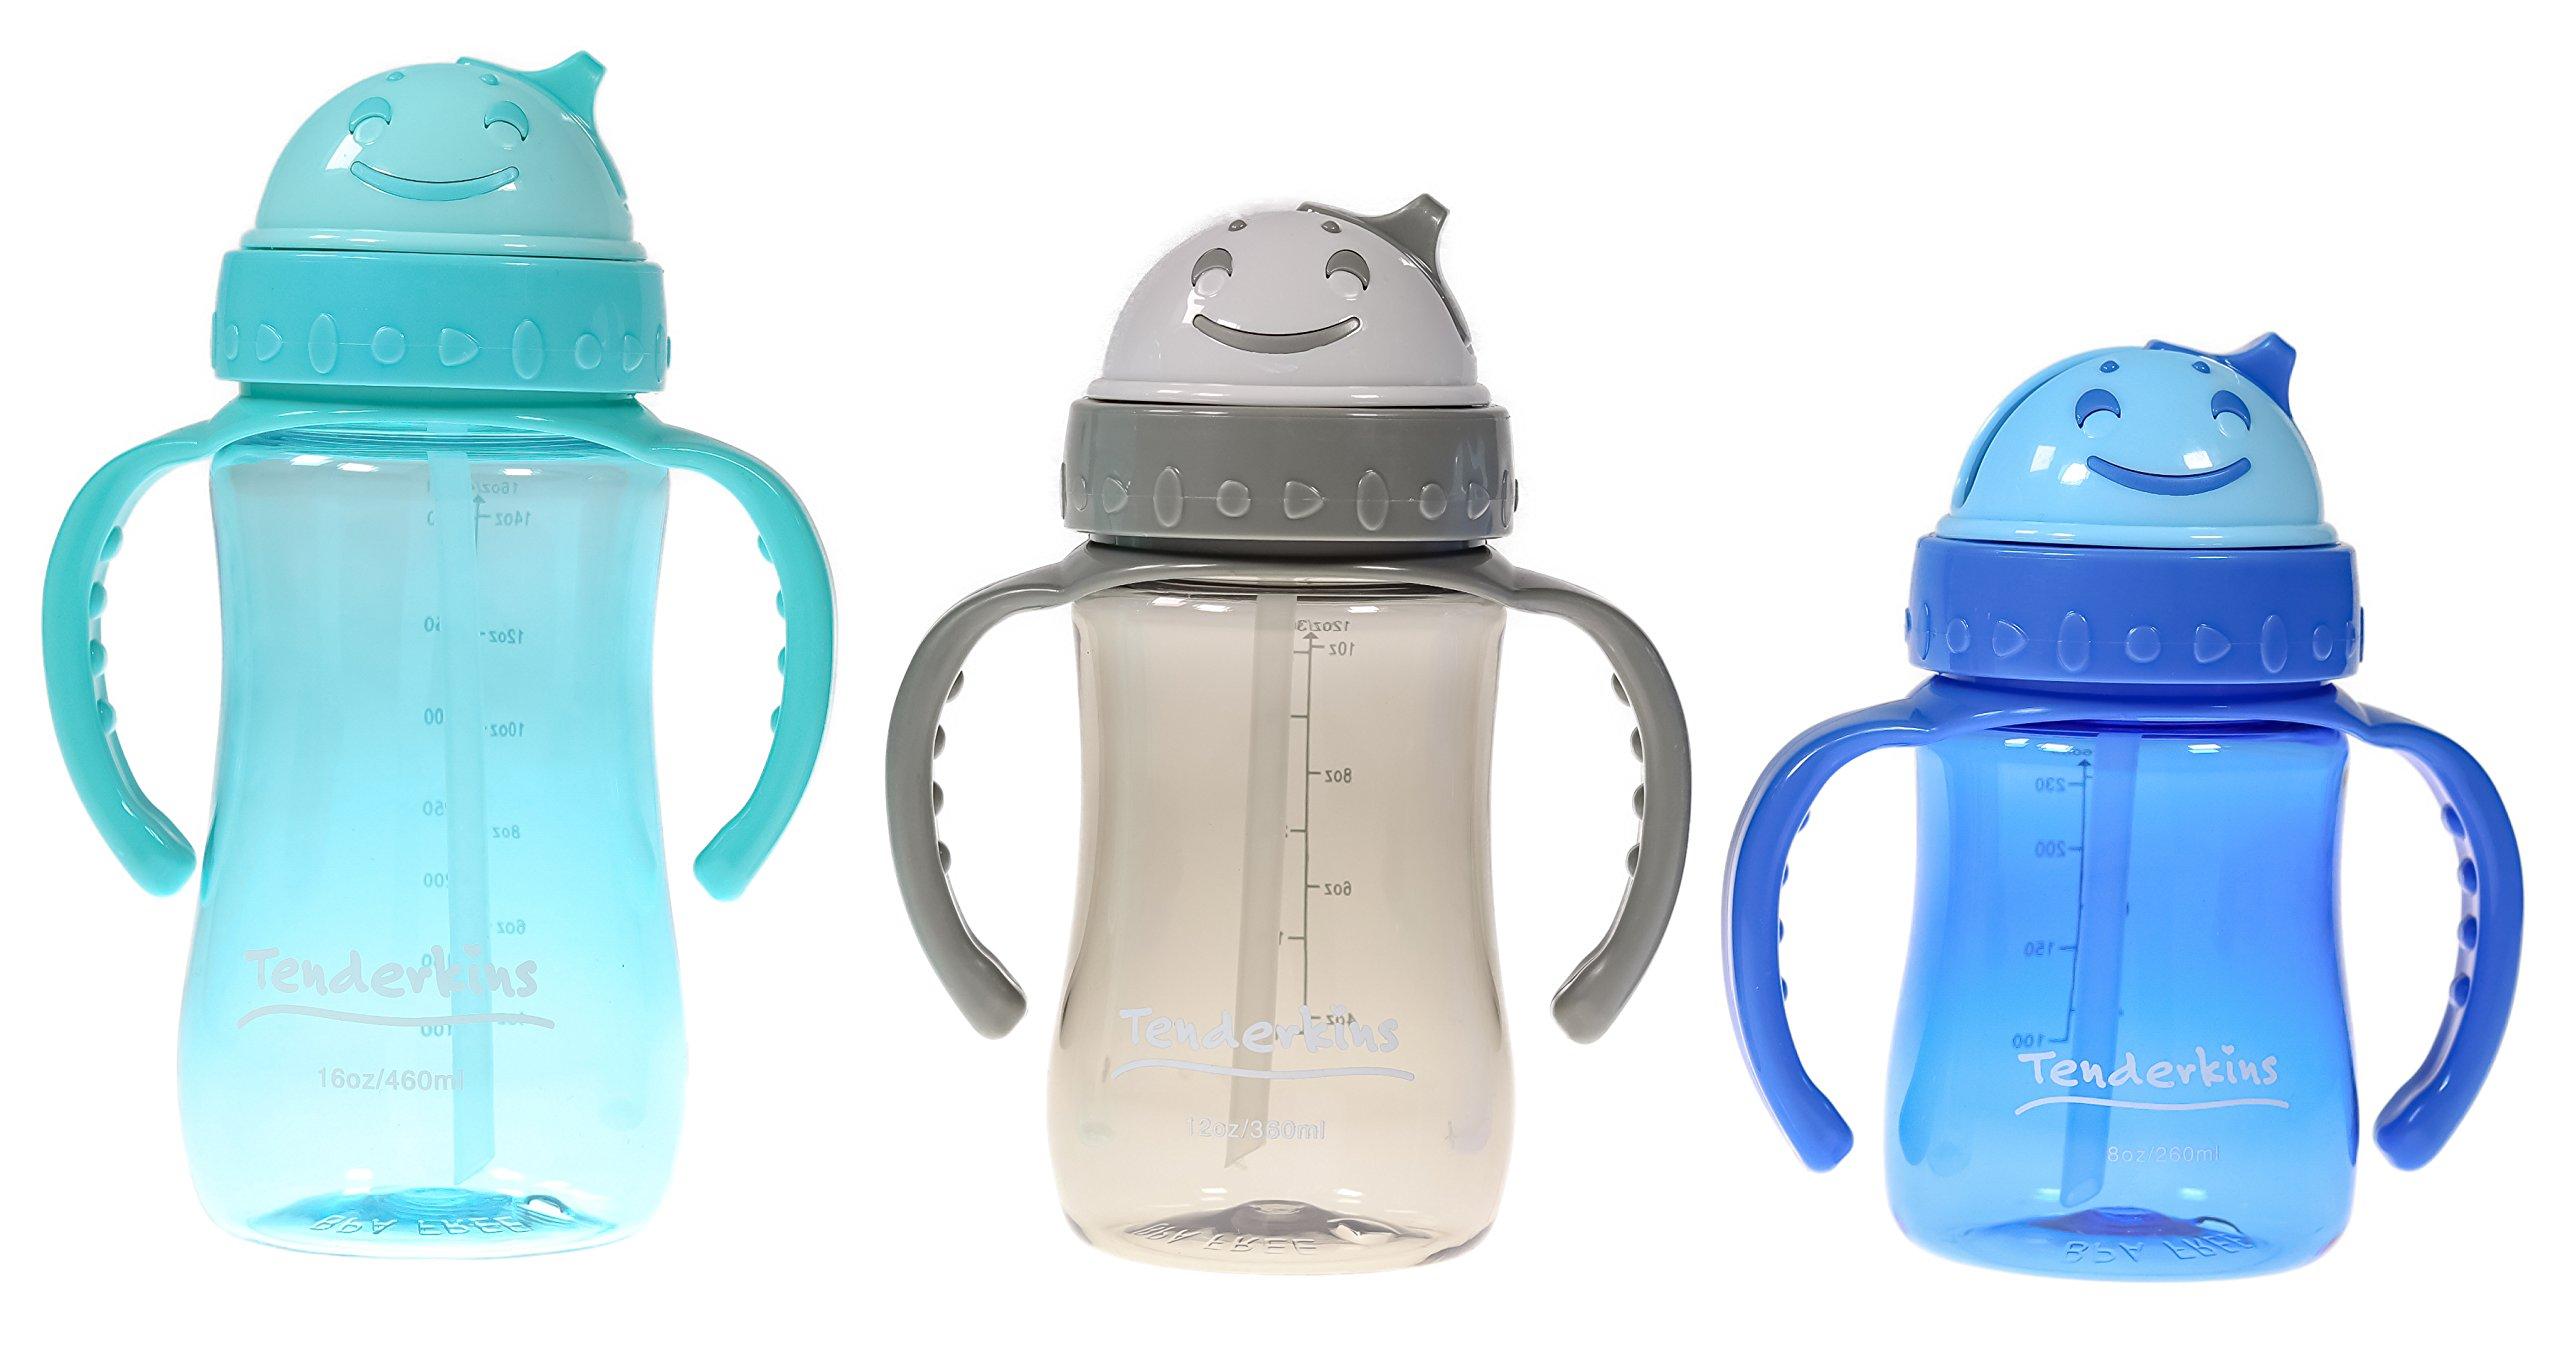 Tenderkins 3-Pack Children's Break-Resistant Water Bottles - 100% Tritan - BPA-Free - 3 Great Sizes Fun Colors - Hide Away Straw - Kid Tested & Approved - by Unity